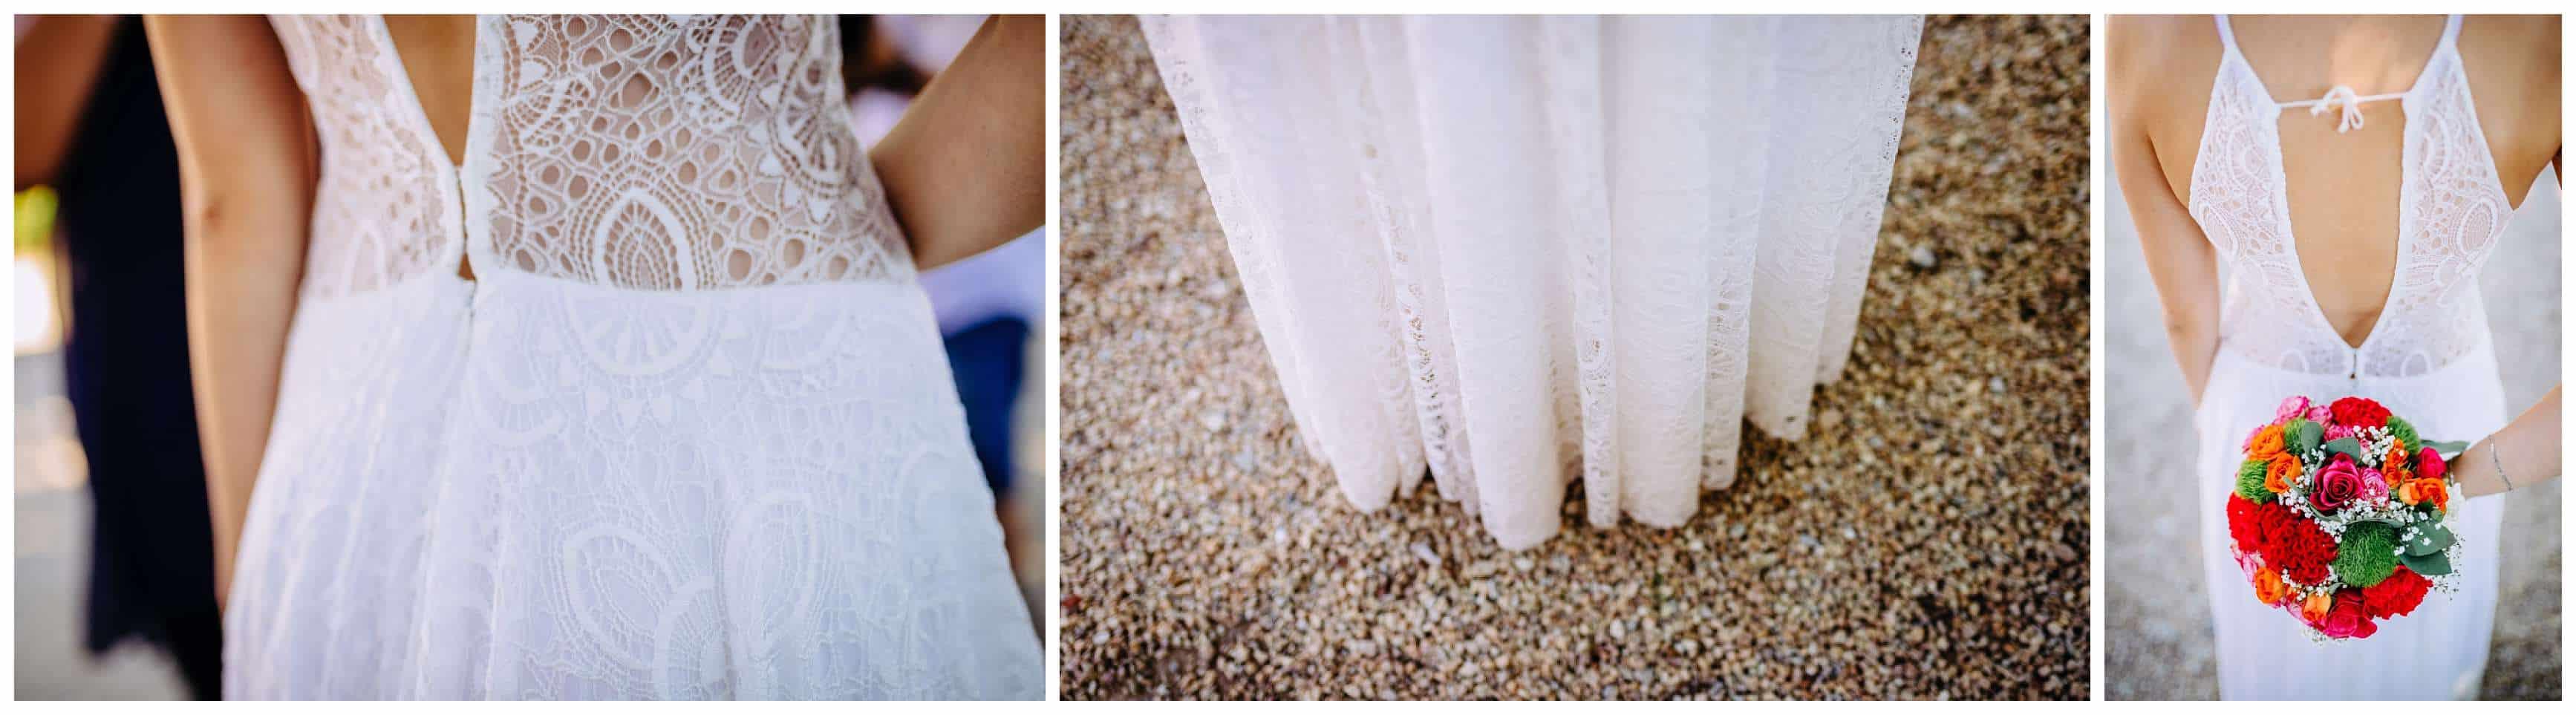 robe de mariée toulouse creatrice